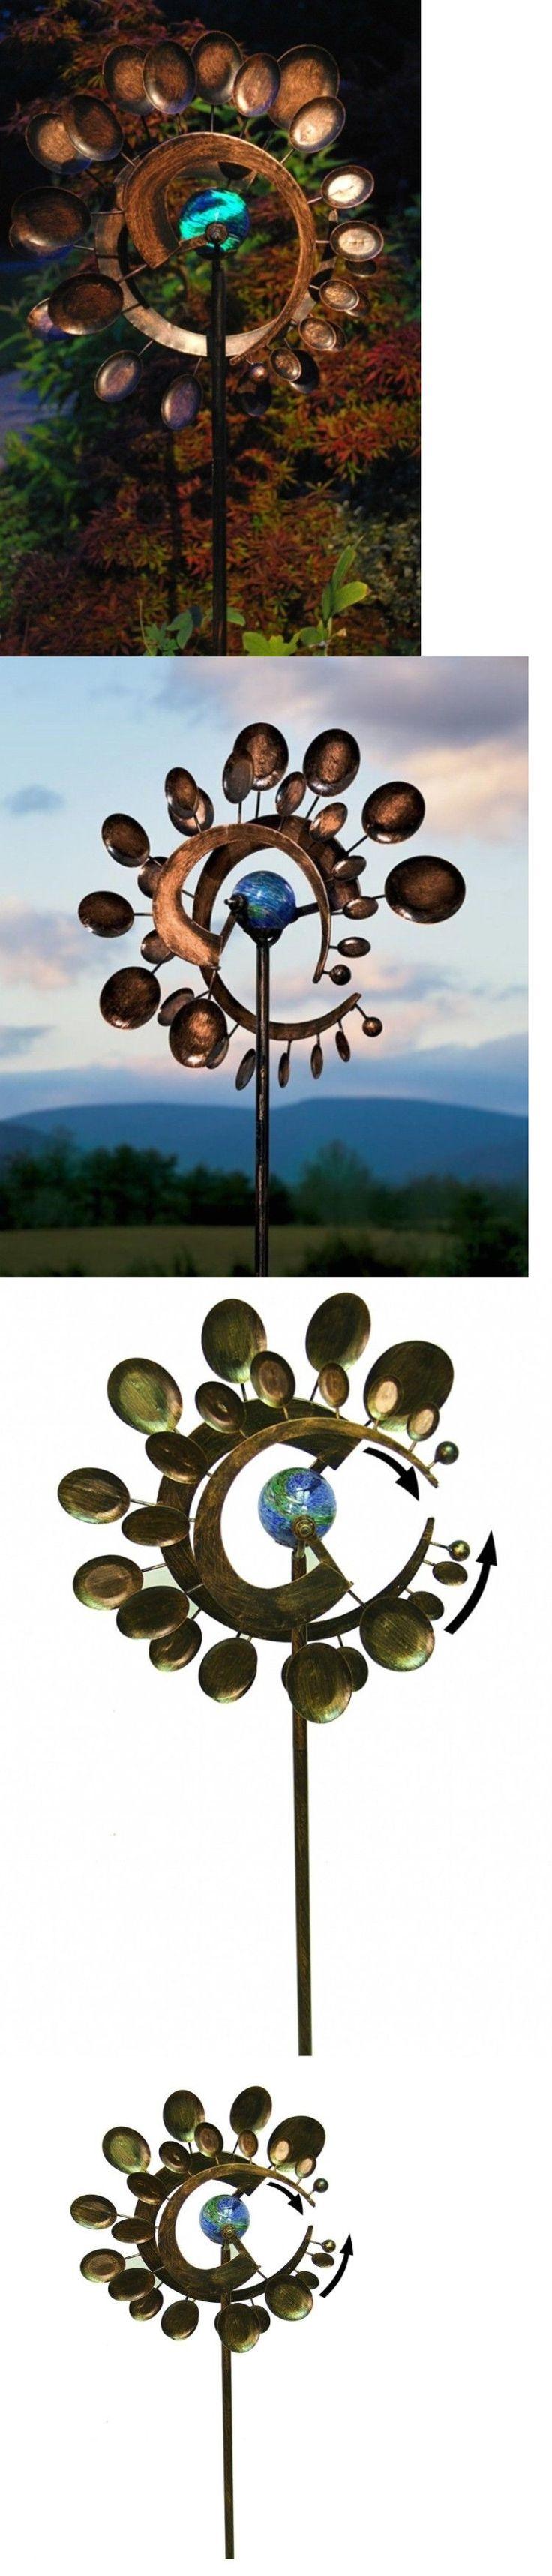 best 25+ yard windmill ideas on pinterest | garden windmill, ann